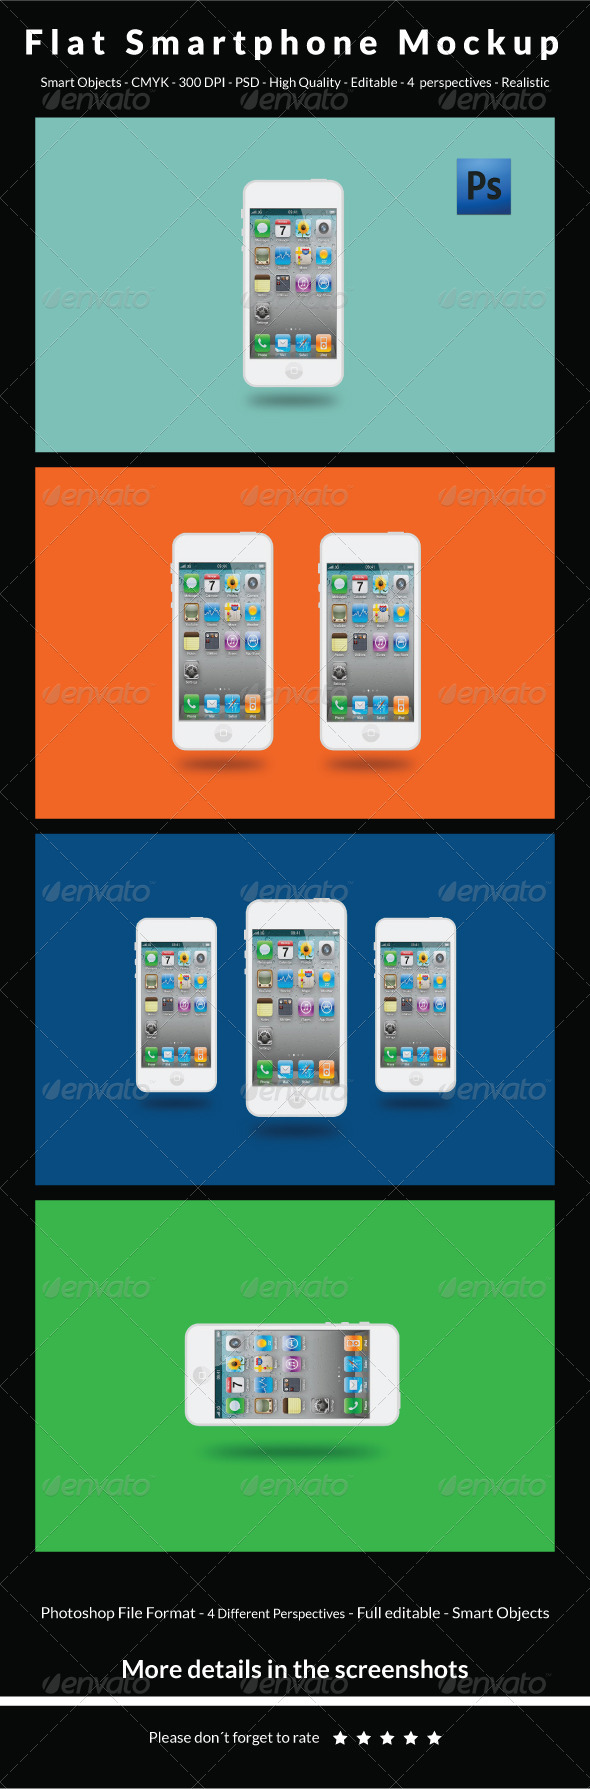 GraphicRiver Flat Smartphone Mockup 6452998